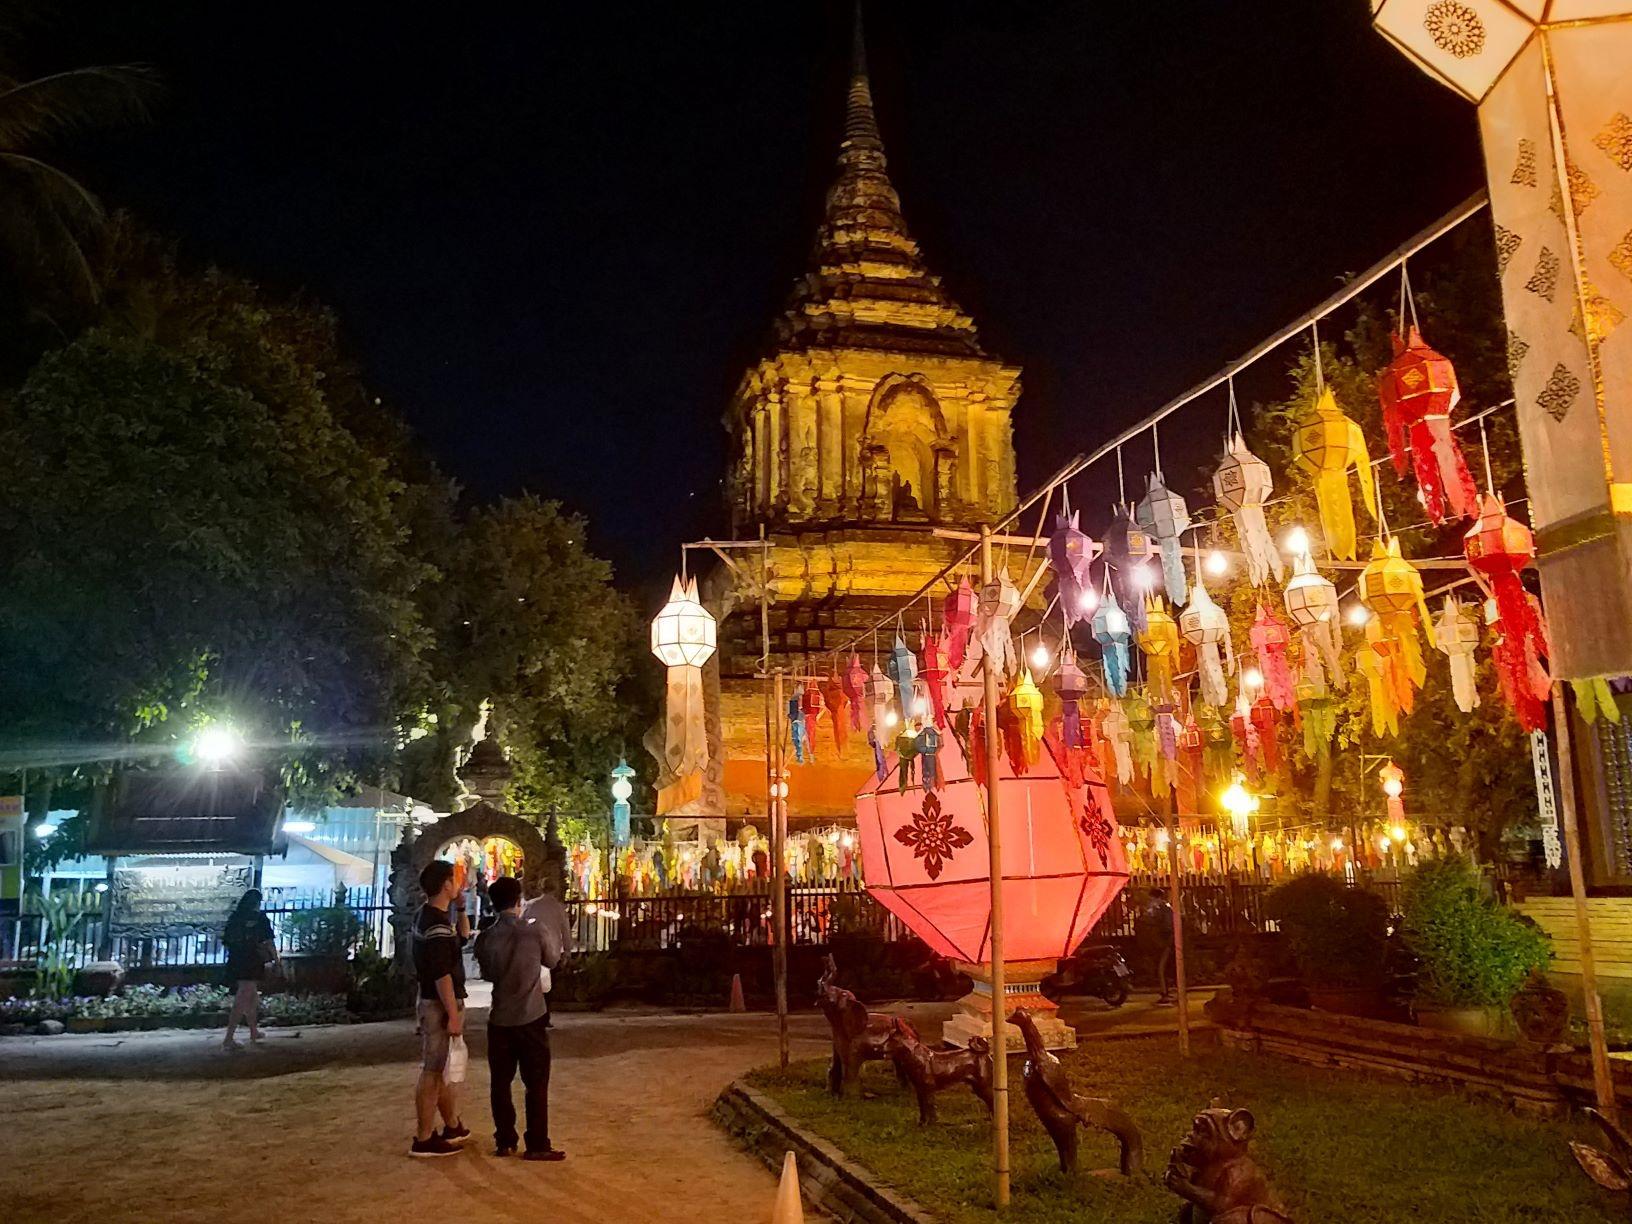 Chiang Mai, Thai Lan mua le hoi lung linh - Yee Peng va Loy Krathong hinh anh 3